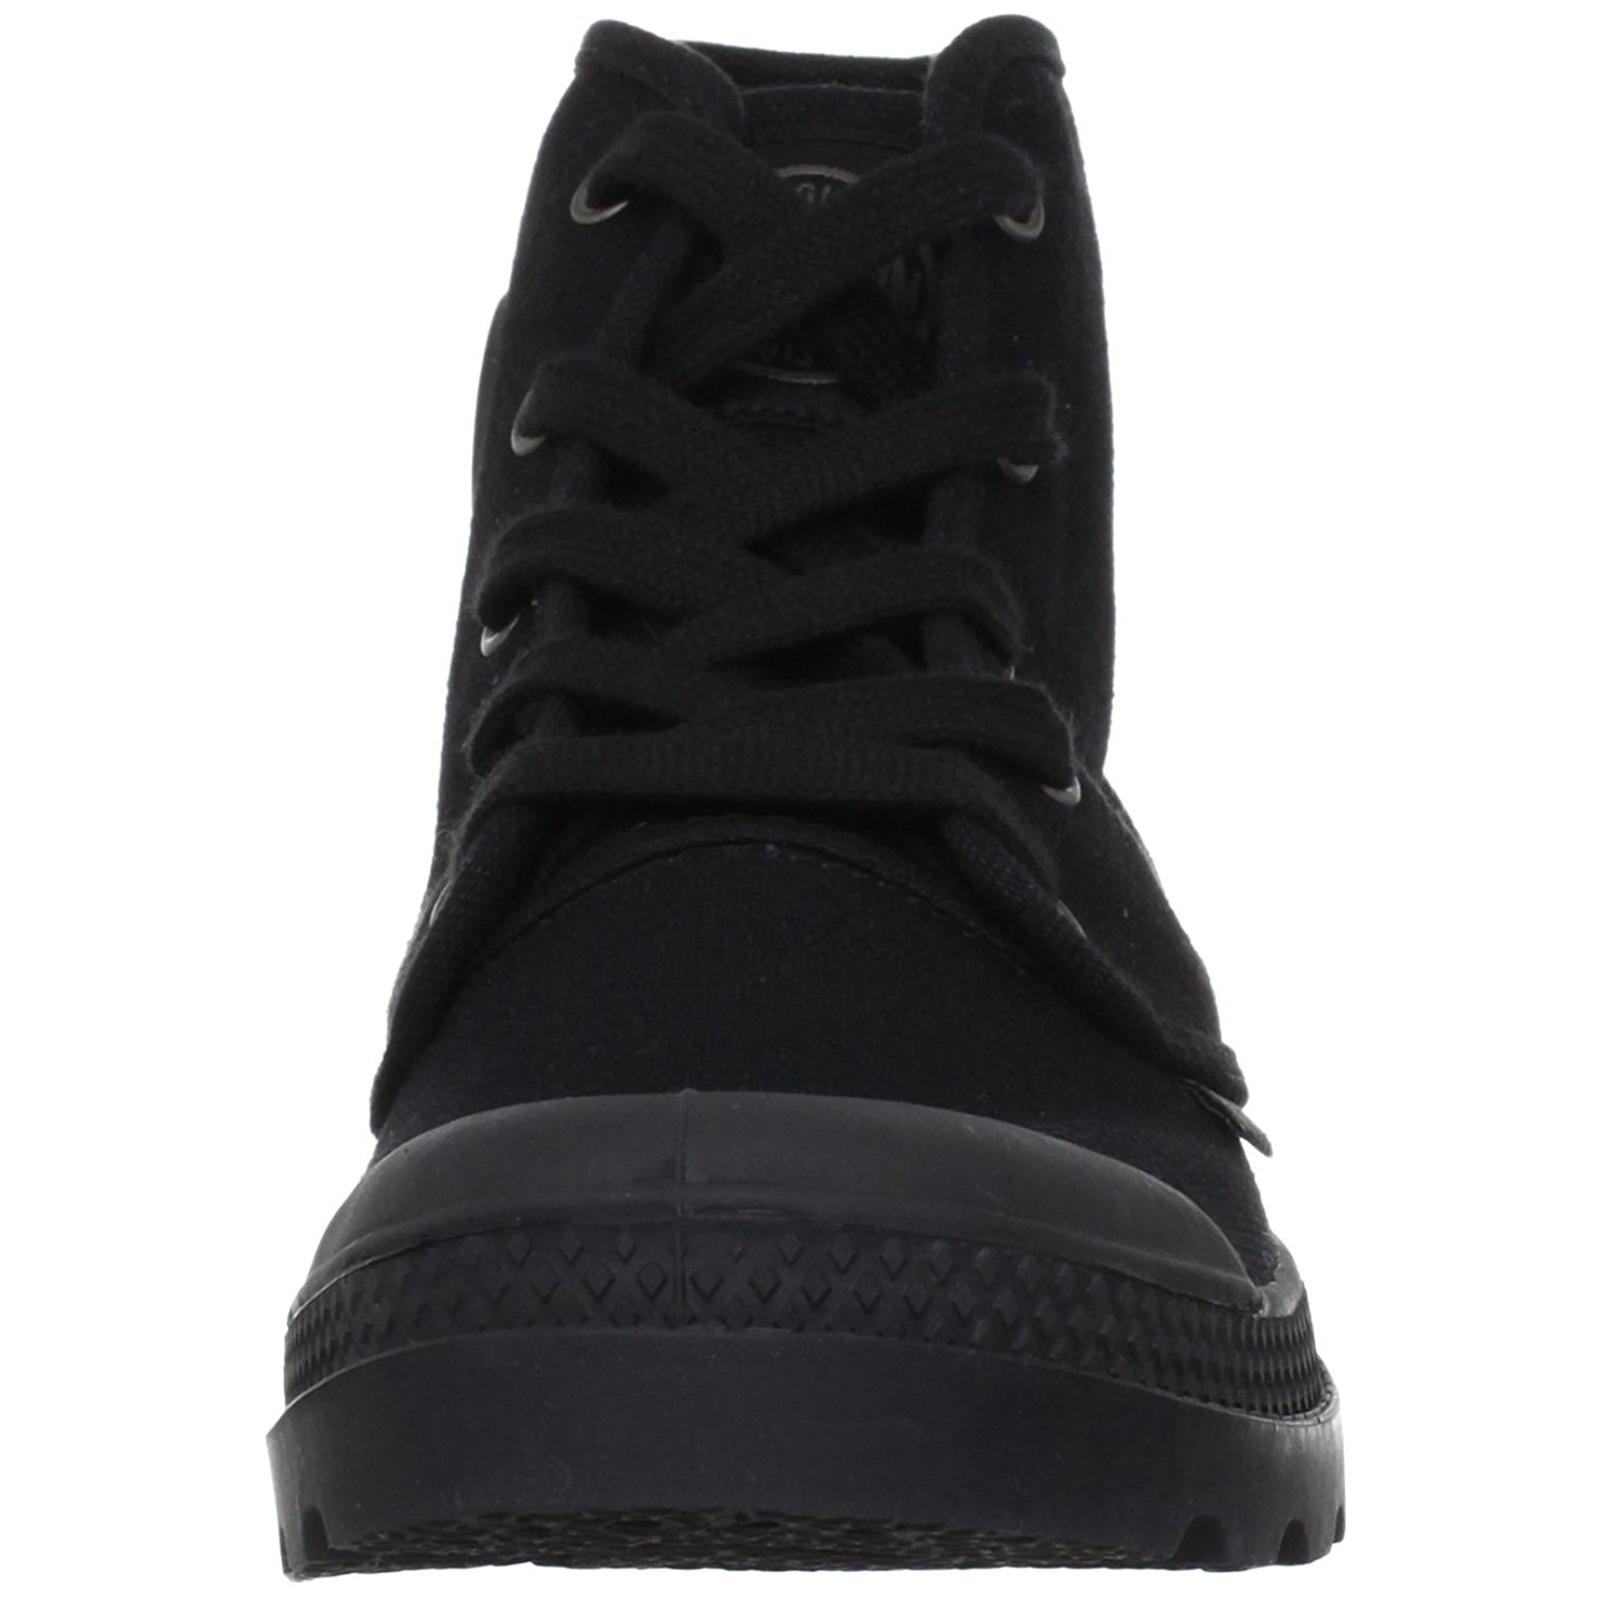 Palladium-Damen-Stiefeletten-Stiefel-Pampa-Hi-Top-Damen-Canvas-Sneaker-Wanderschuhe Indexbild 5